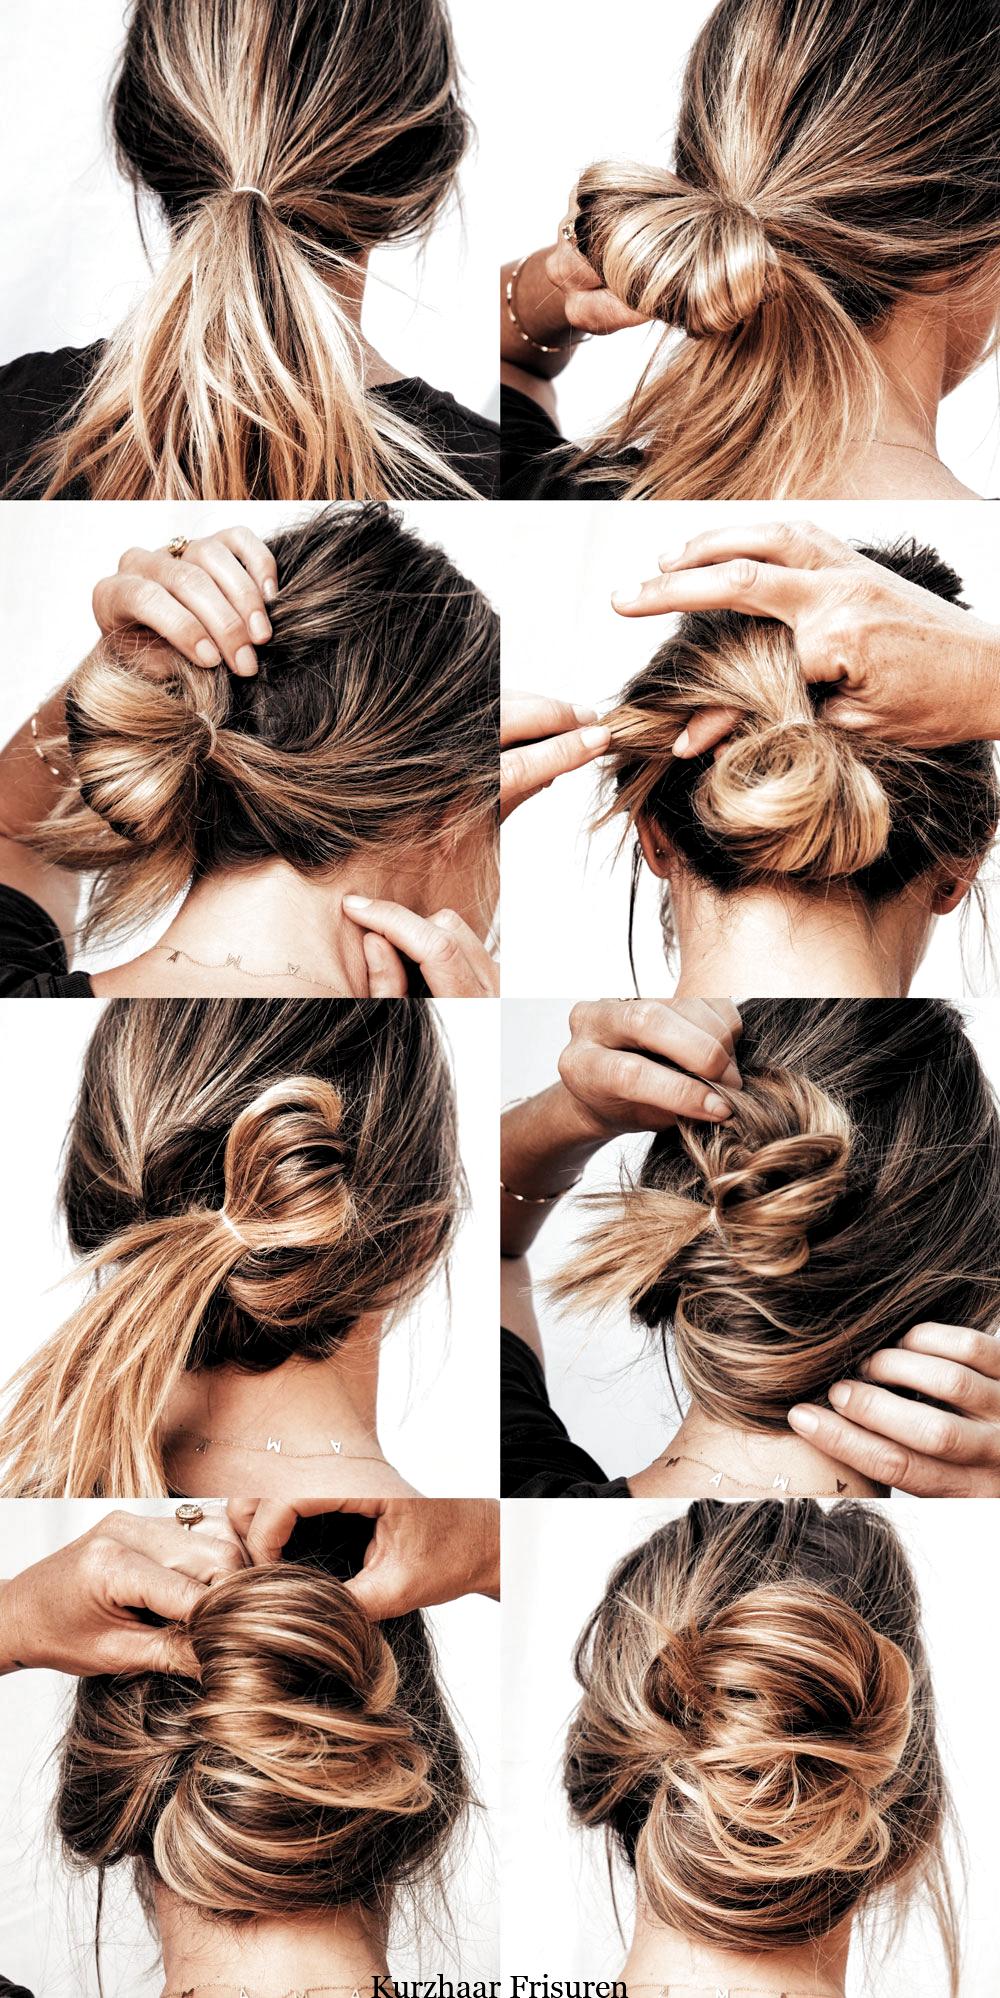 Heisses Chaos Haar Chaos Einfache Lange Frisuren Fiko Blog Blog Chaos Einfache Schone Frisuren Mittellange Haare Stilvolle Frisuren Frisur Hochgesteckt